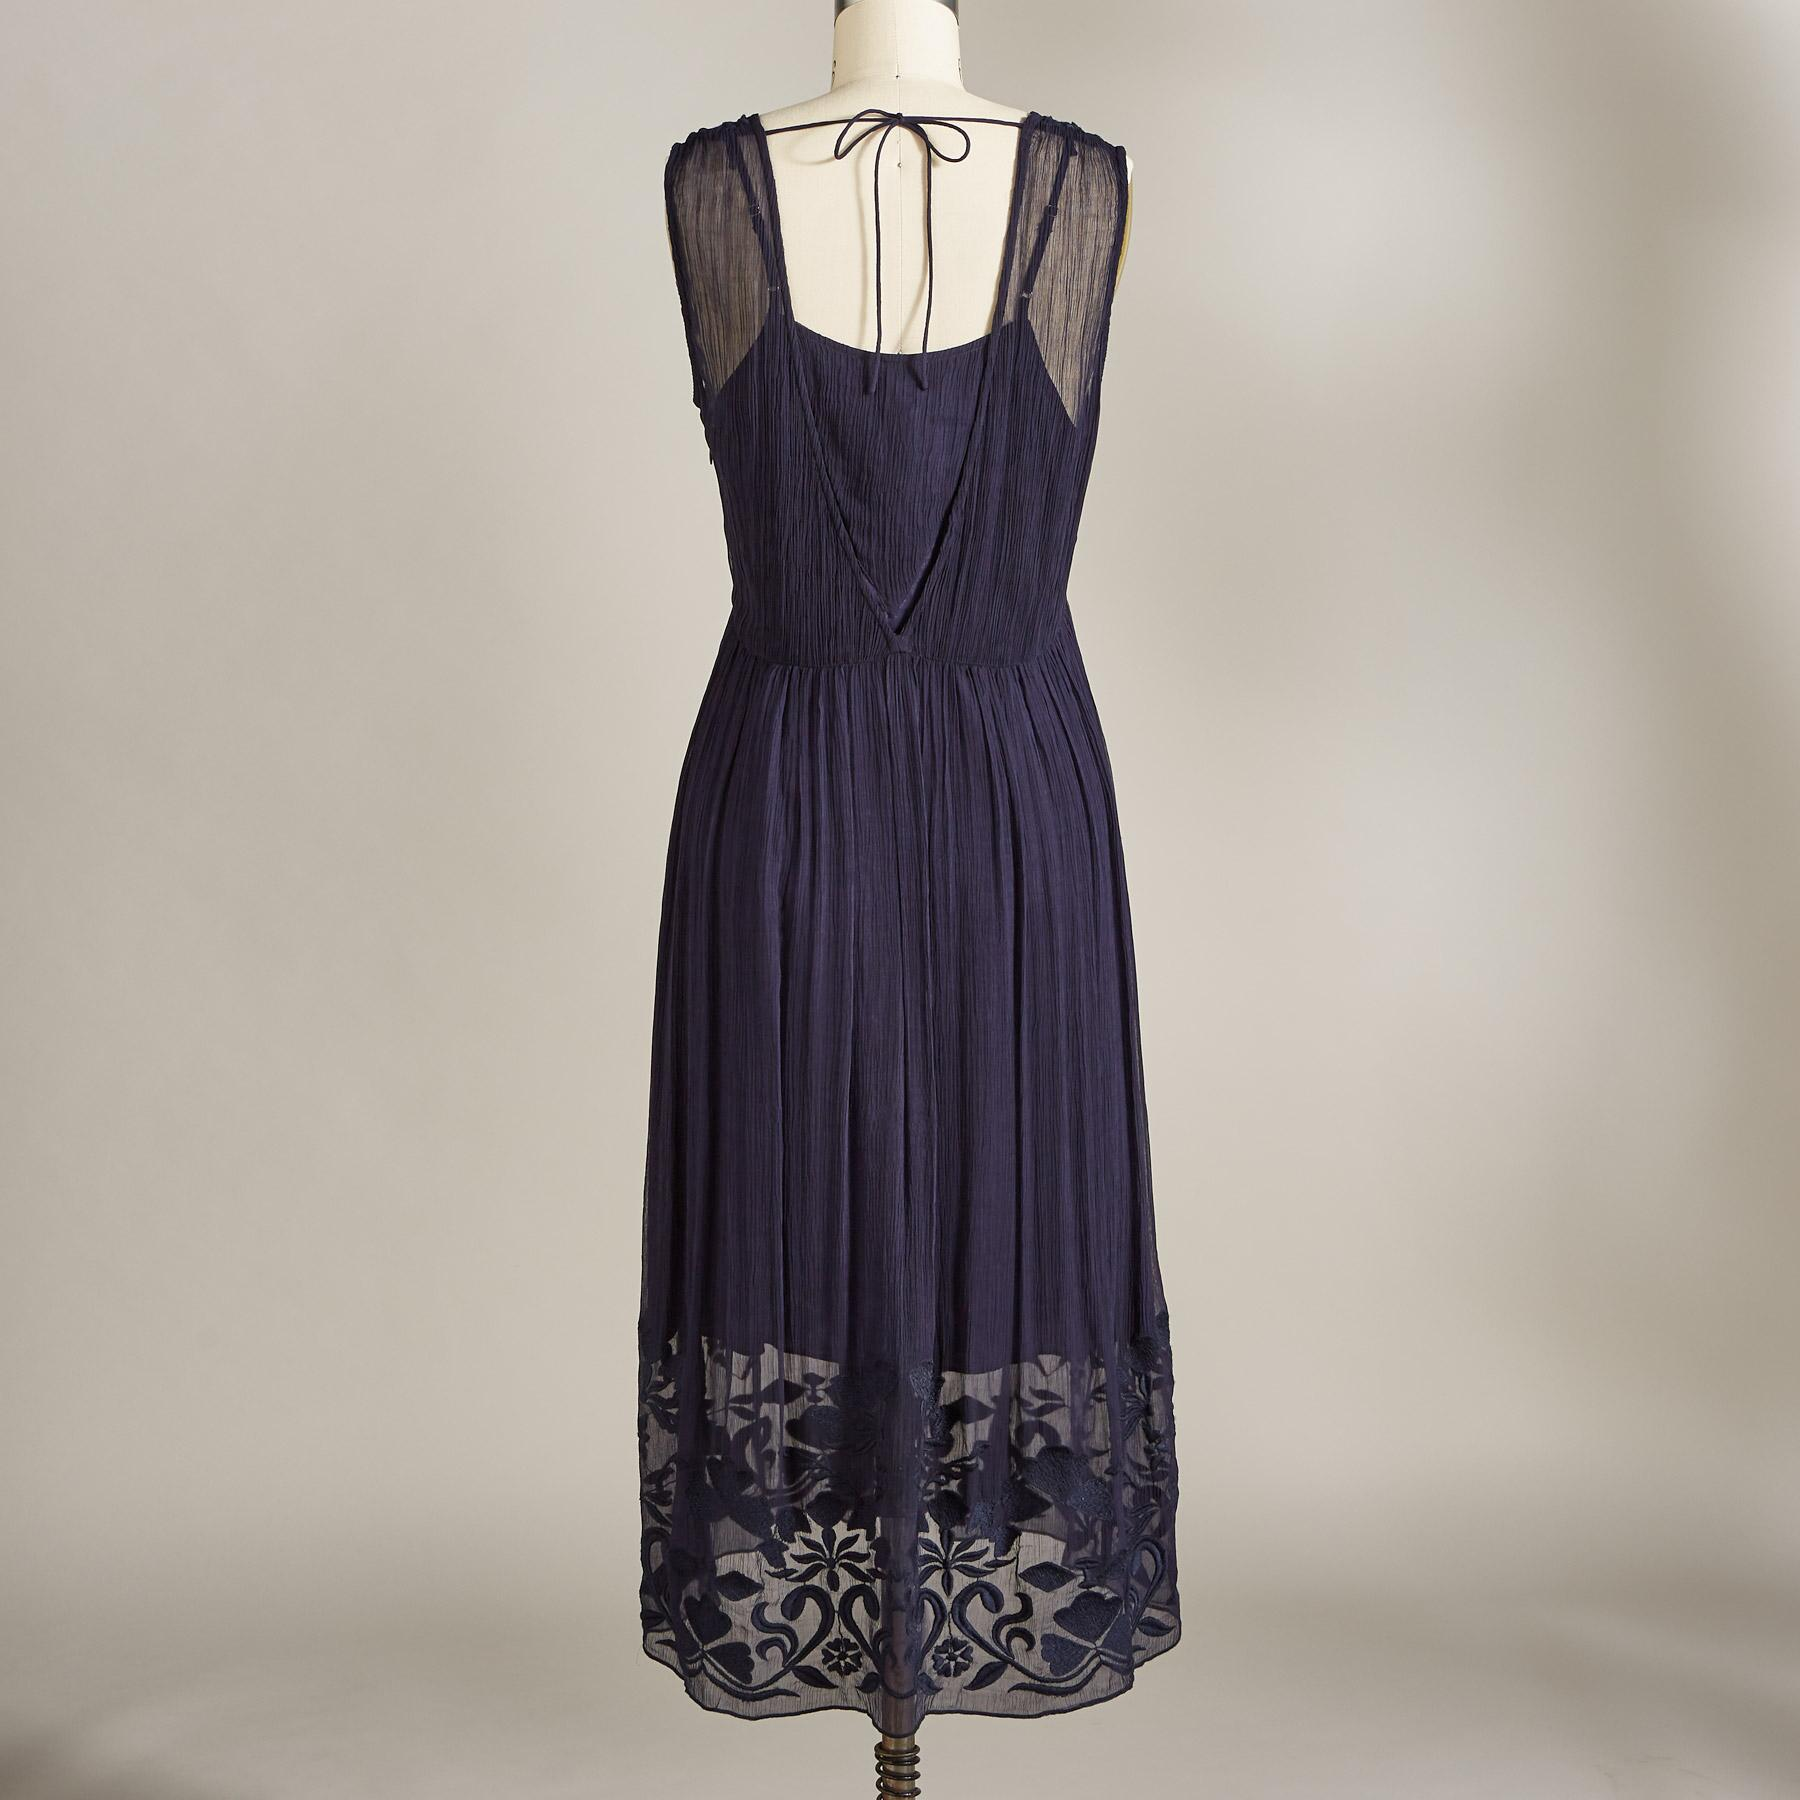 ANGELINA DRESS - PETITES: View 2